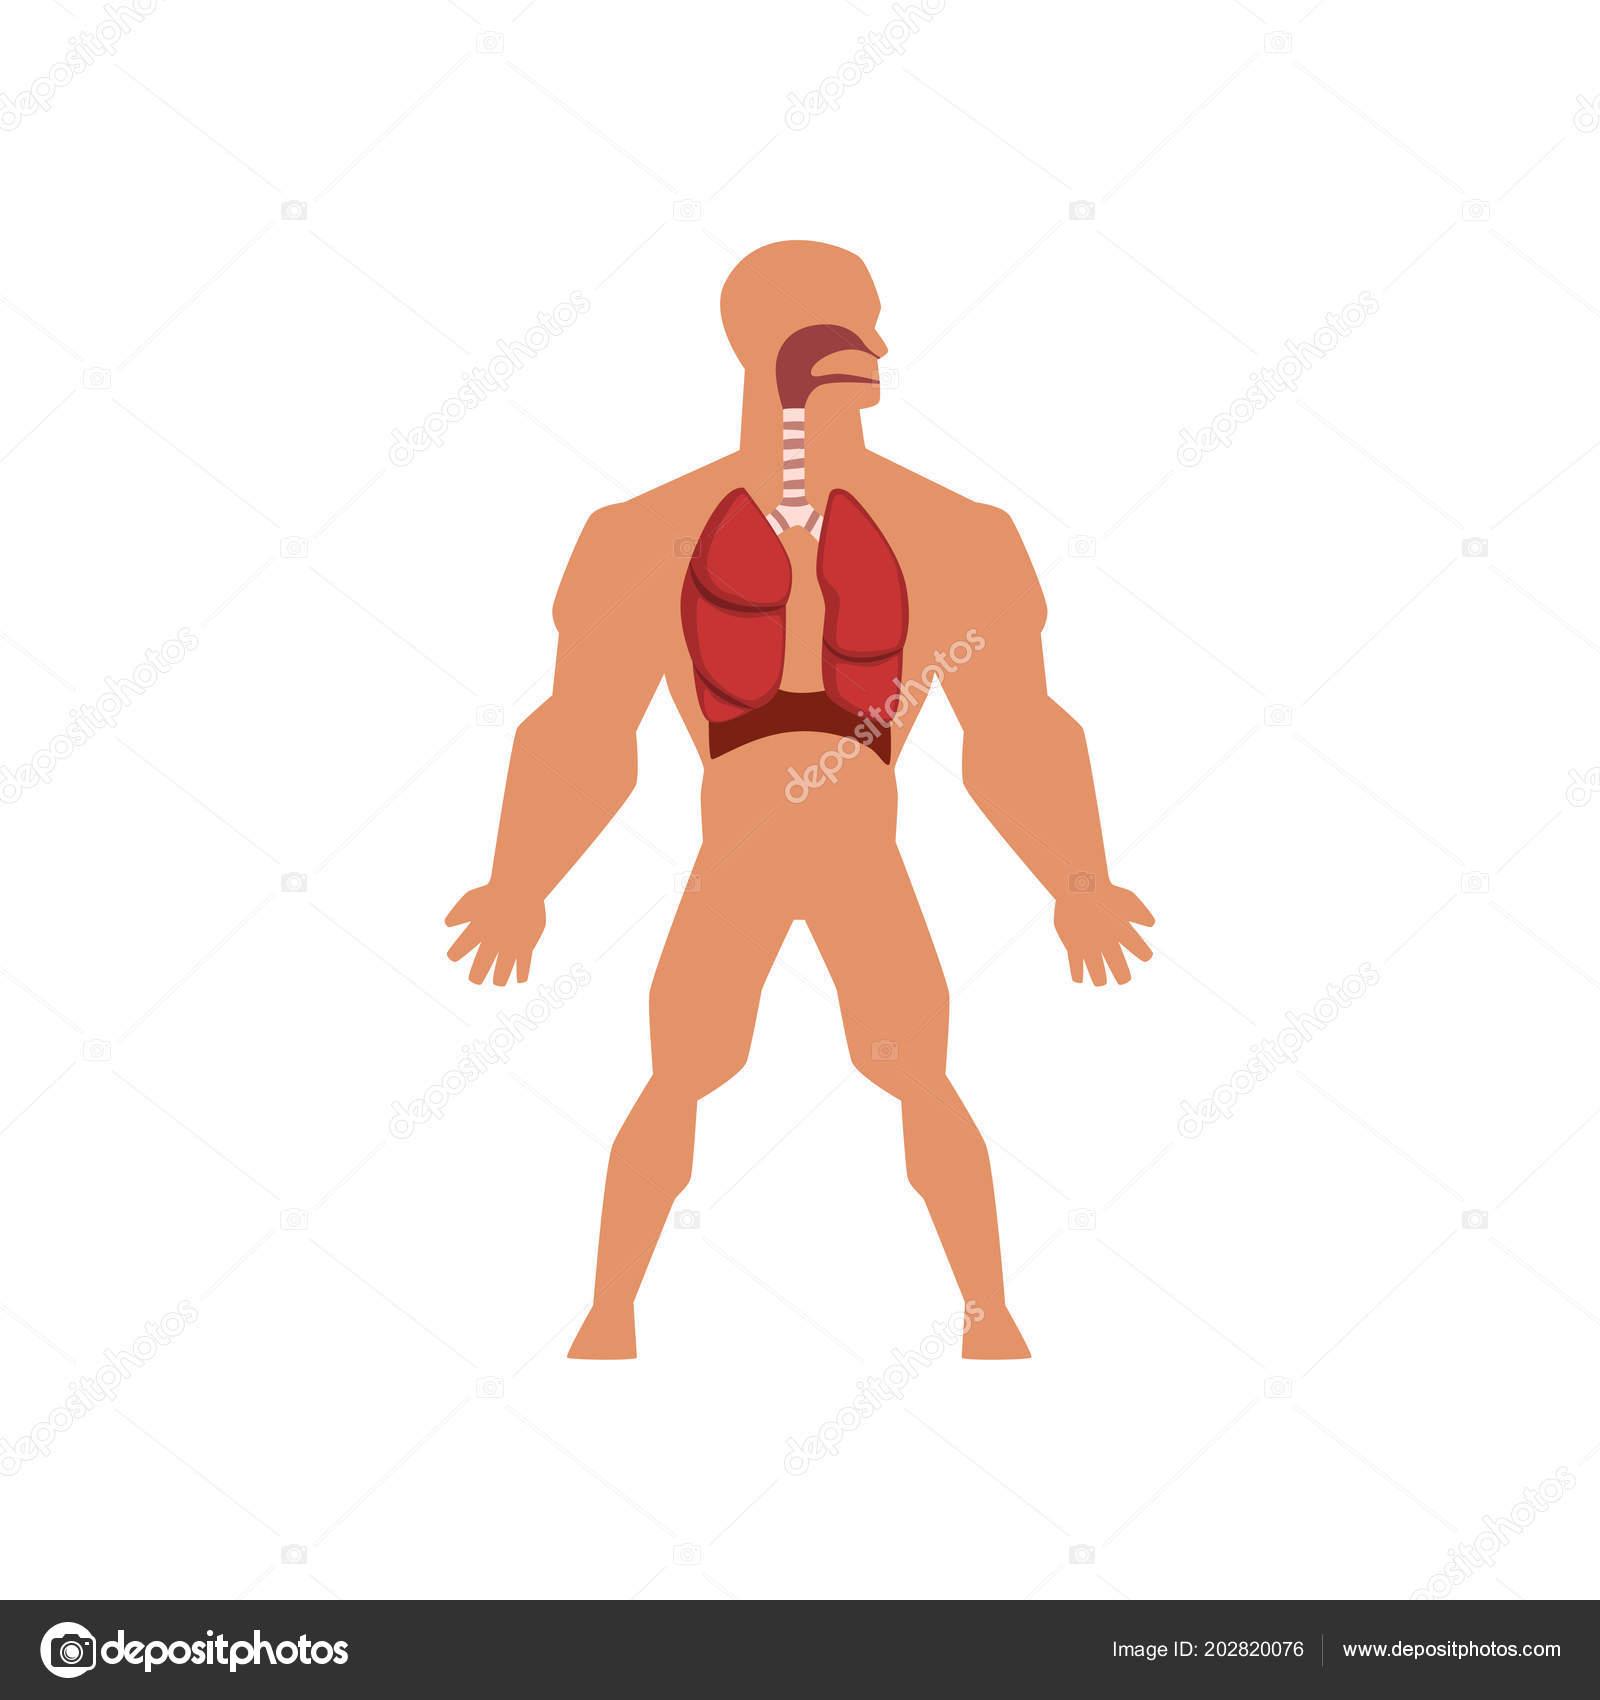 Human Biological Respiratory System Anatomy Of Human Body Vector